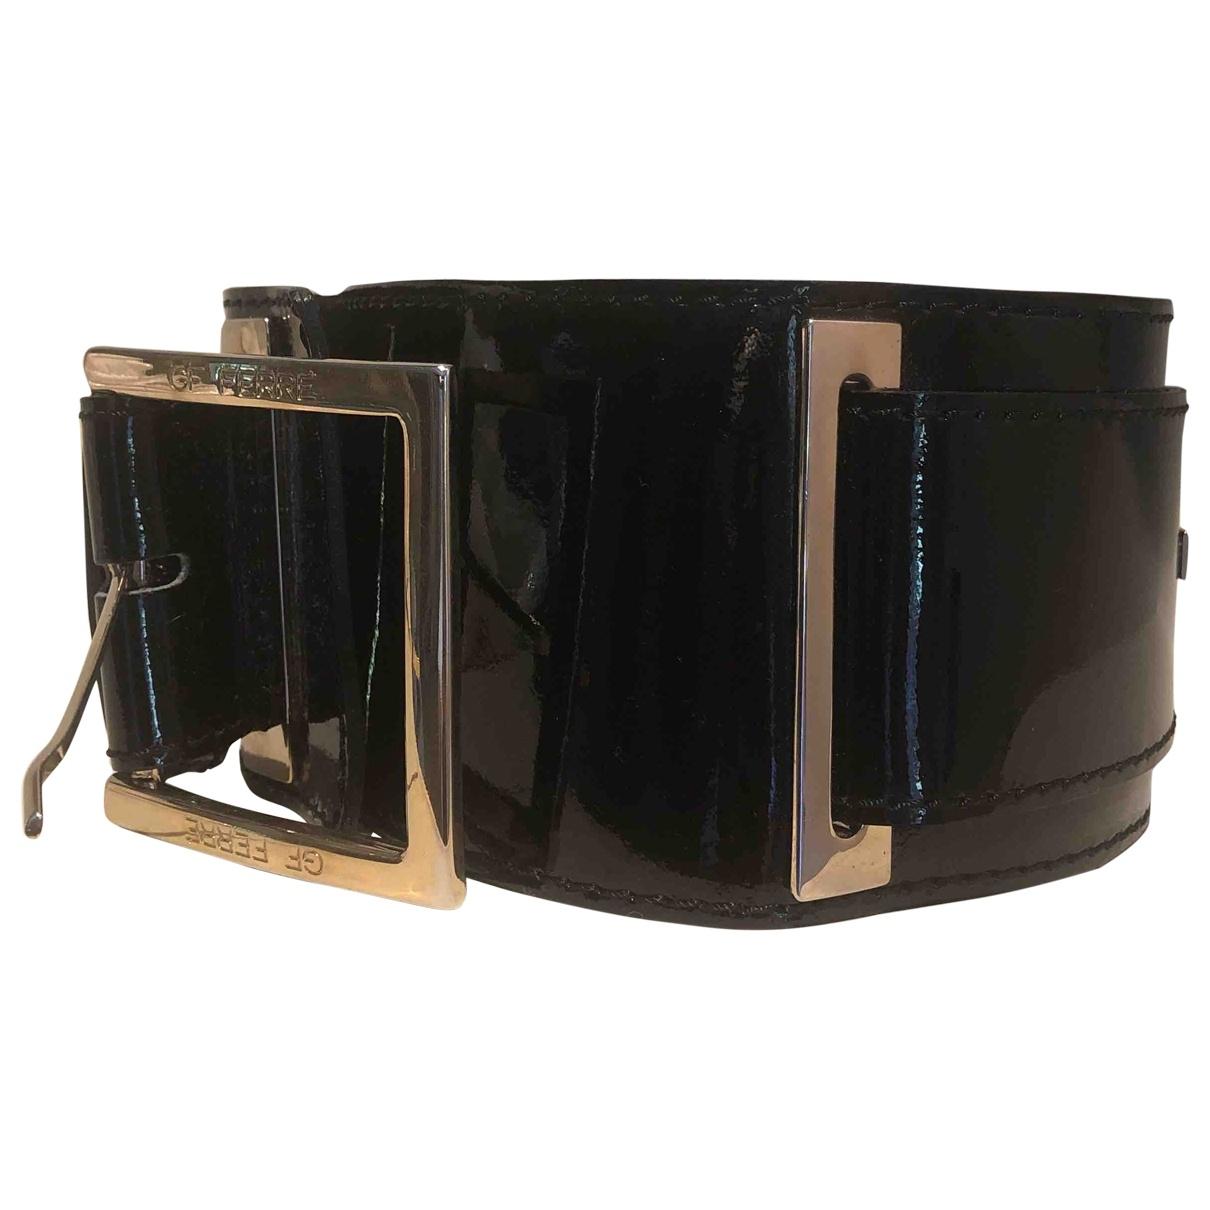 Gianfranco Ferré \N Black Patent leather belt for Women 75 cm